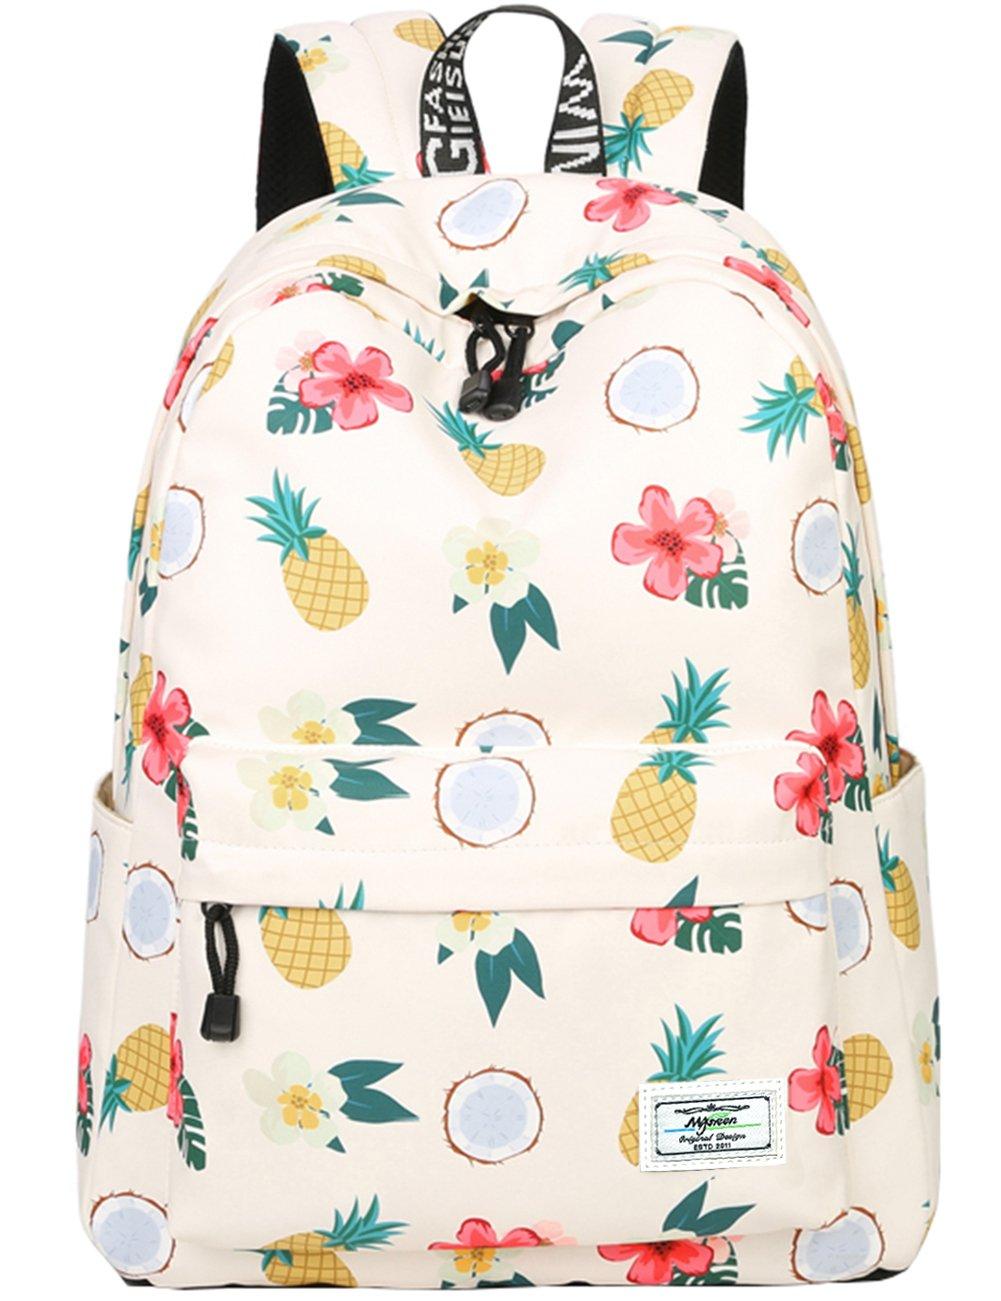 School Bookbags for Girls, Cute casual lightweight Pineapple Backpack College Bags Women Daypack Travel Bag by Mygreen (Beige)